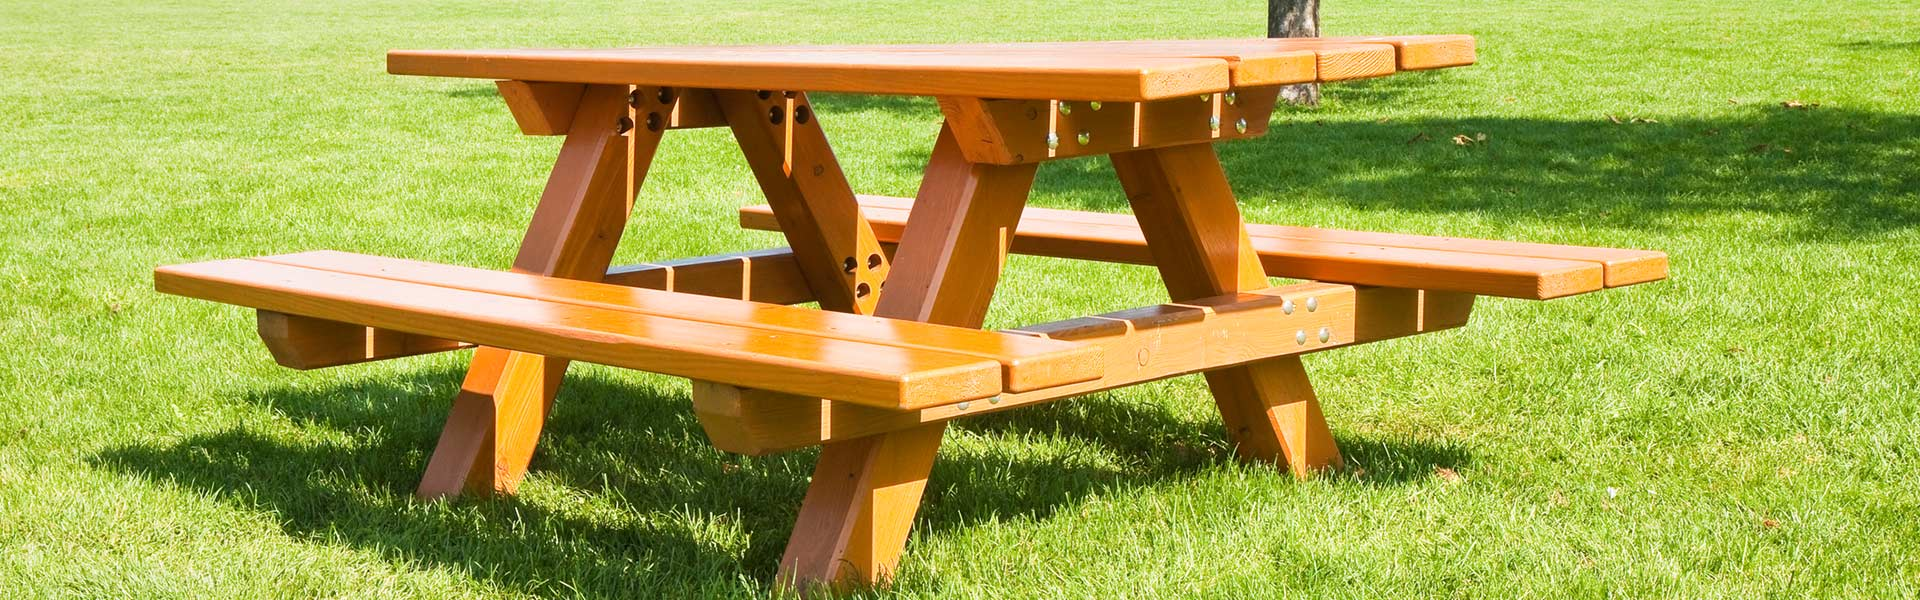 panther timber hardware picnic table